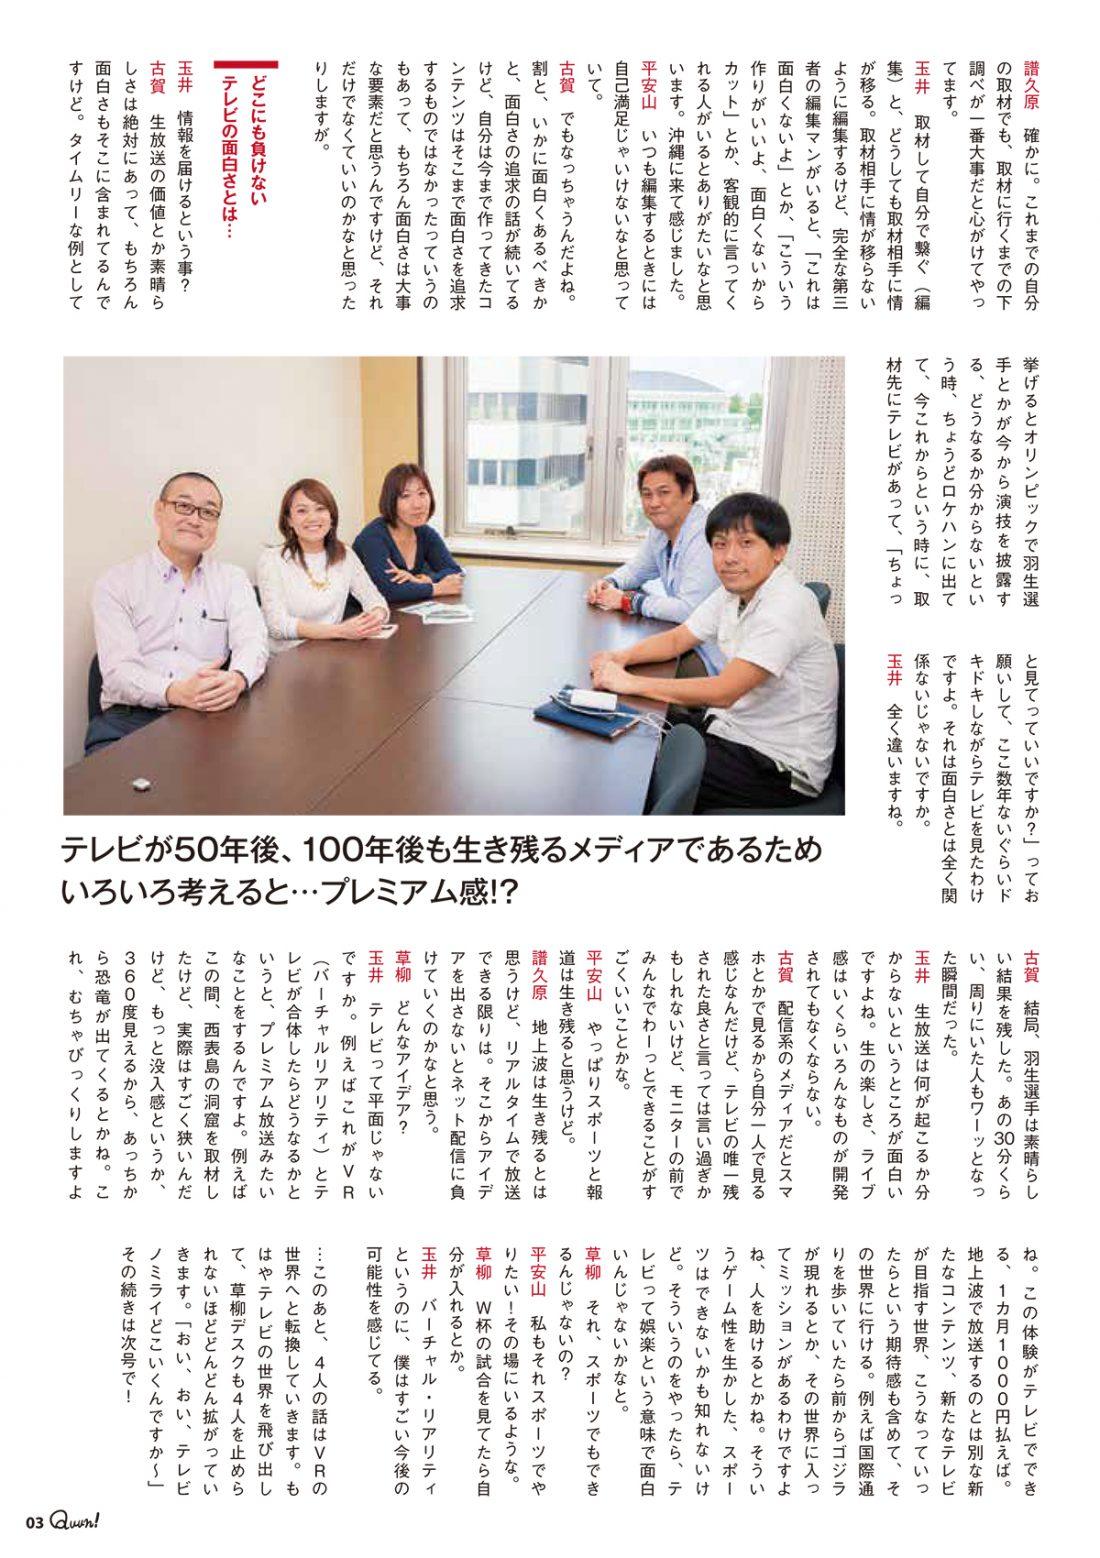 https://www.qab.co.jp/qgoro/wp-content/uploads/quun_0905-1100x1558.jpg